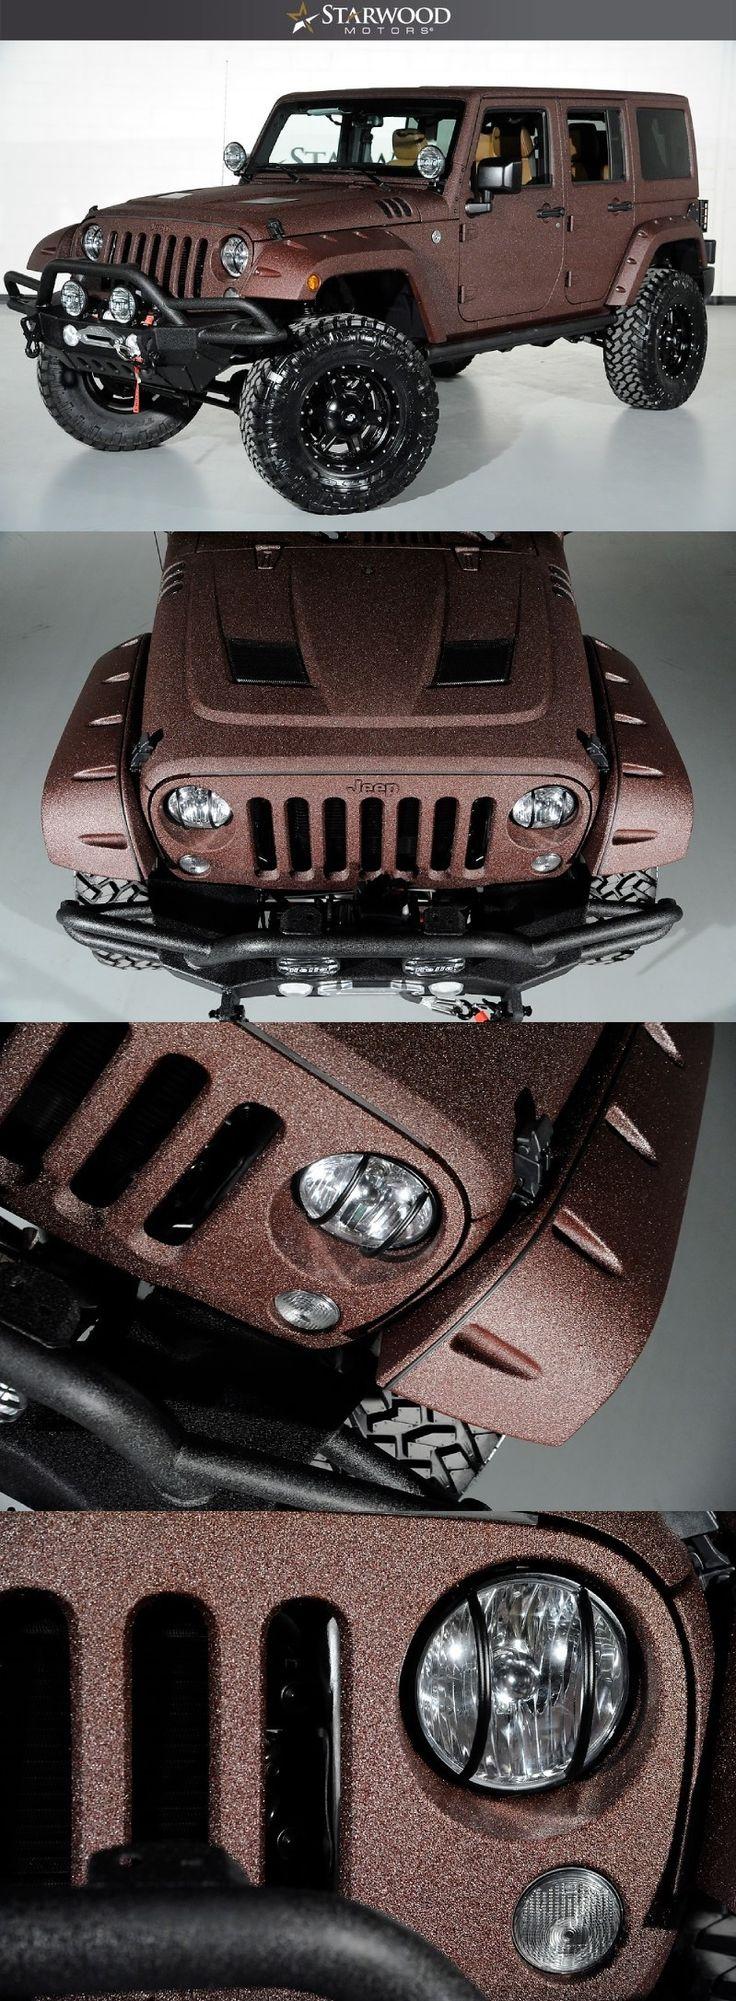 Starwood Motors - Maserati Bordeaux Metallic Finish #StarwoodMotors #Jeep #JeepWrangler #CustomJeep #JeepMods #JeepLife #Offroad #oIIIIIIIo #itsajeepthing #jeepthing #Jeepin #Jeepers #JeepNation